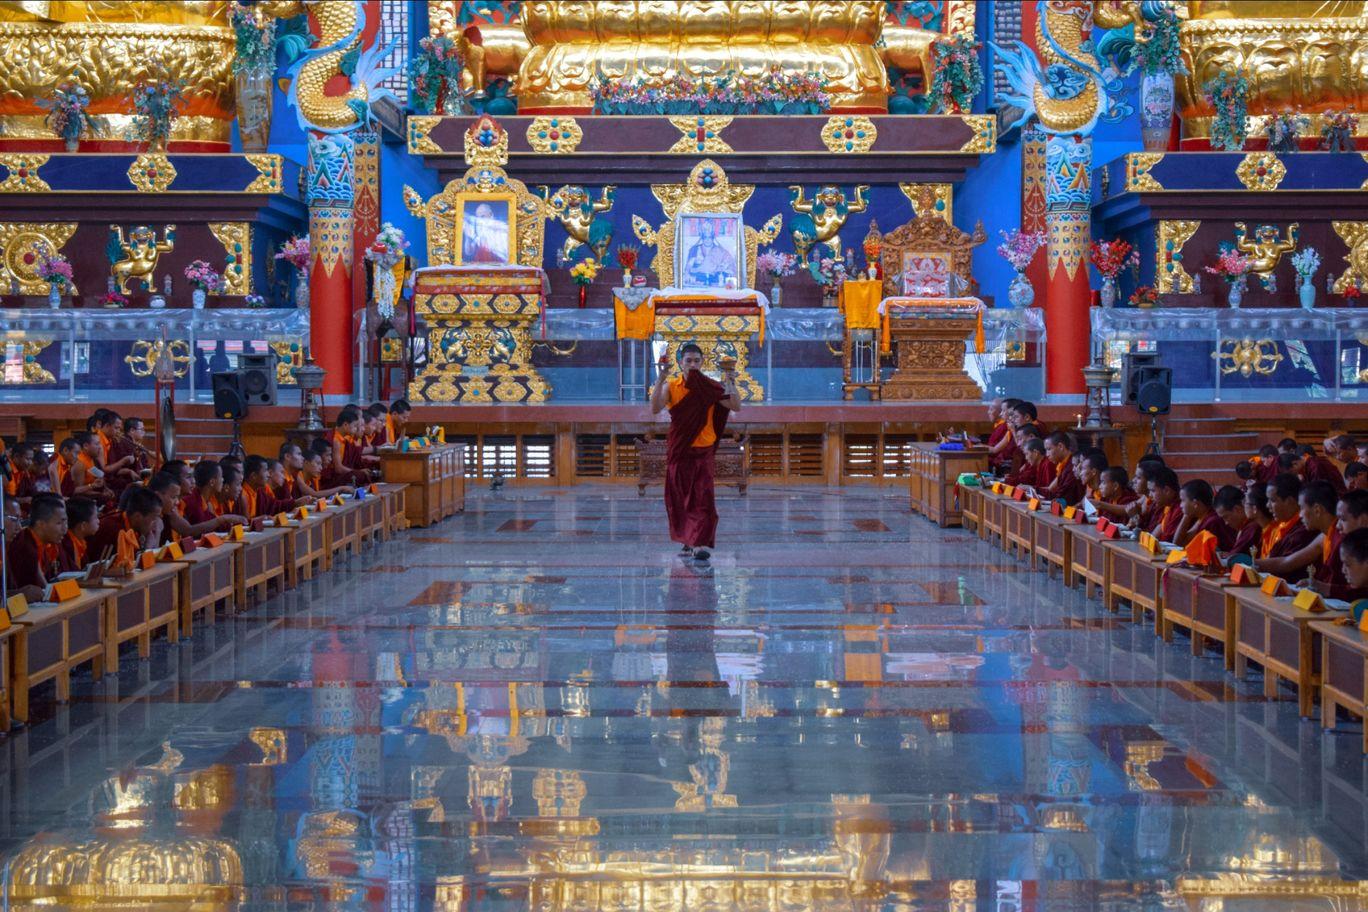 Photo of Namdroling Monastery Golden Temple By Alan Paul Jaxon